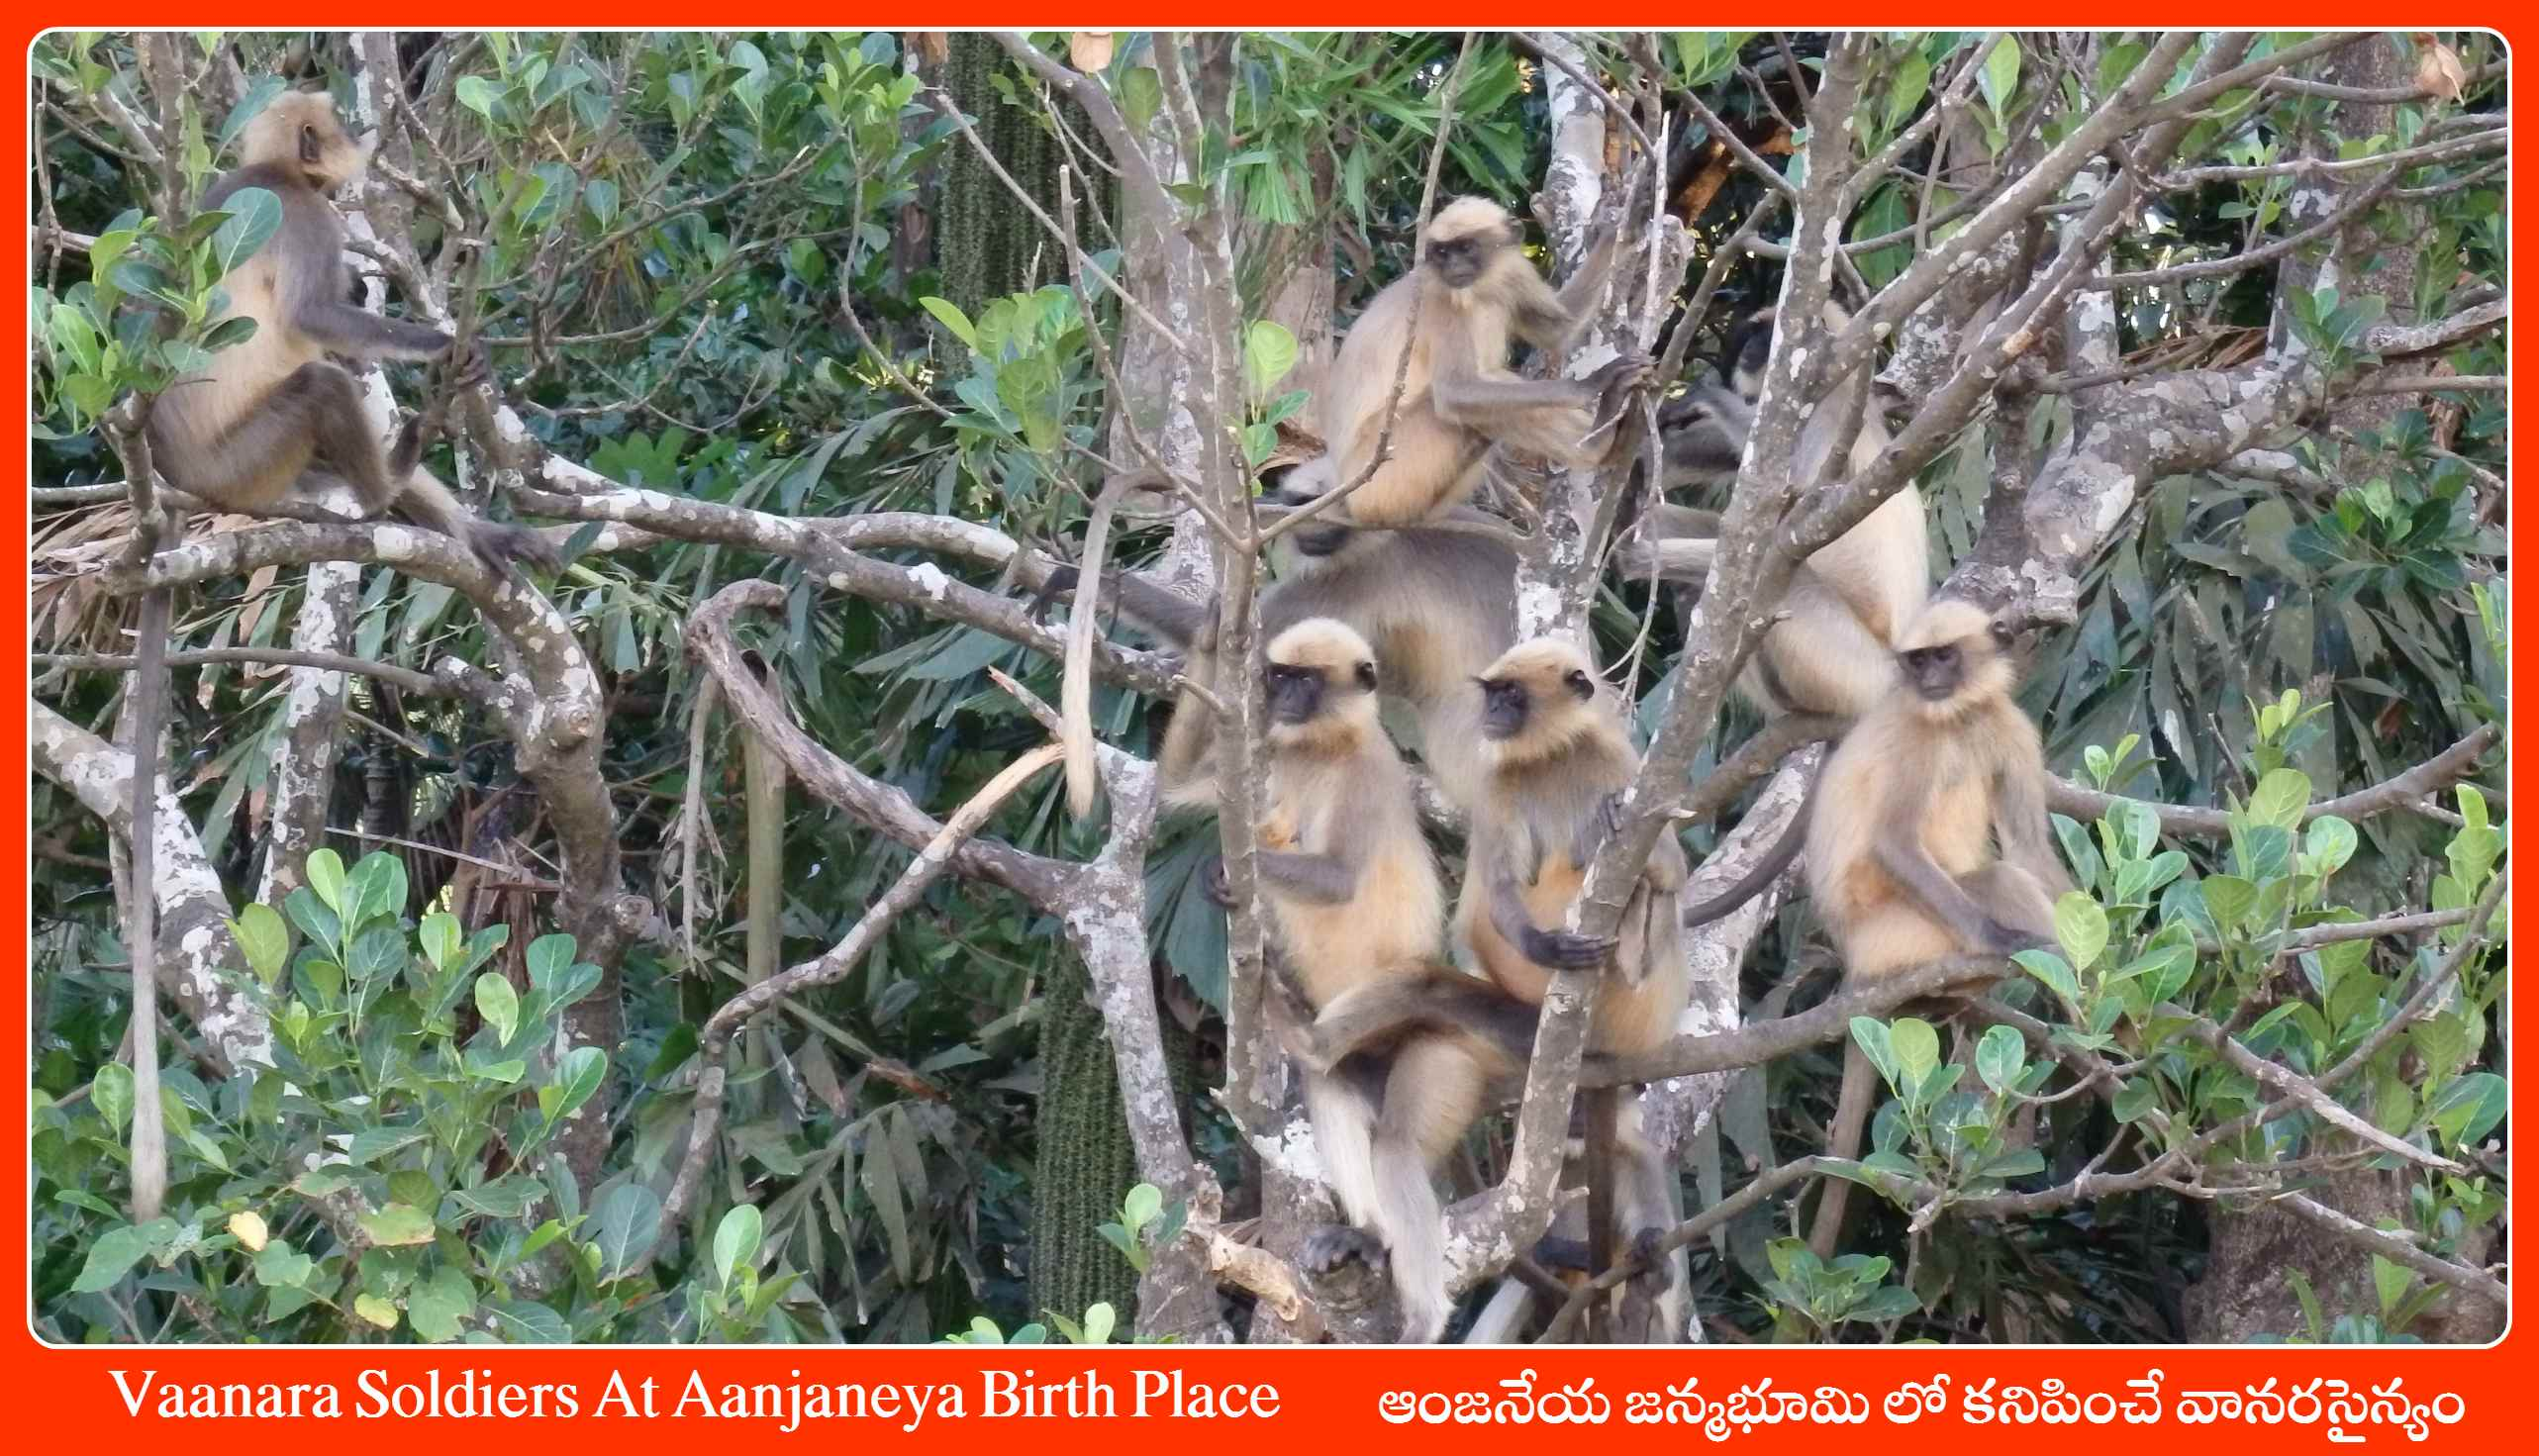 Vaanara Soldiers At Aanjaneya Birth Place - Gokarna